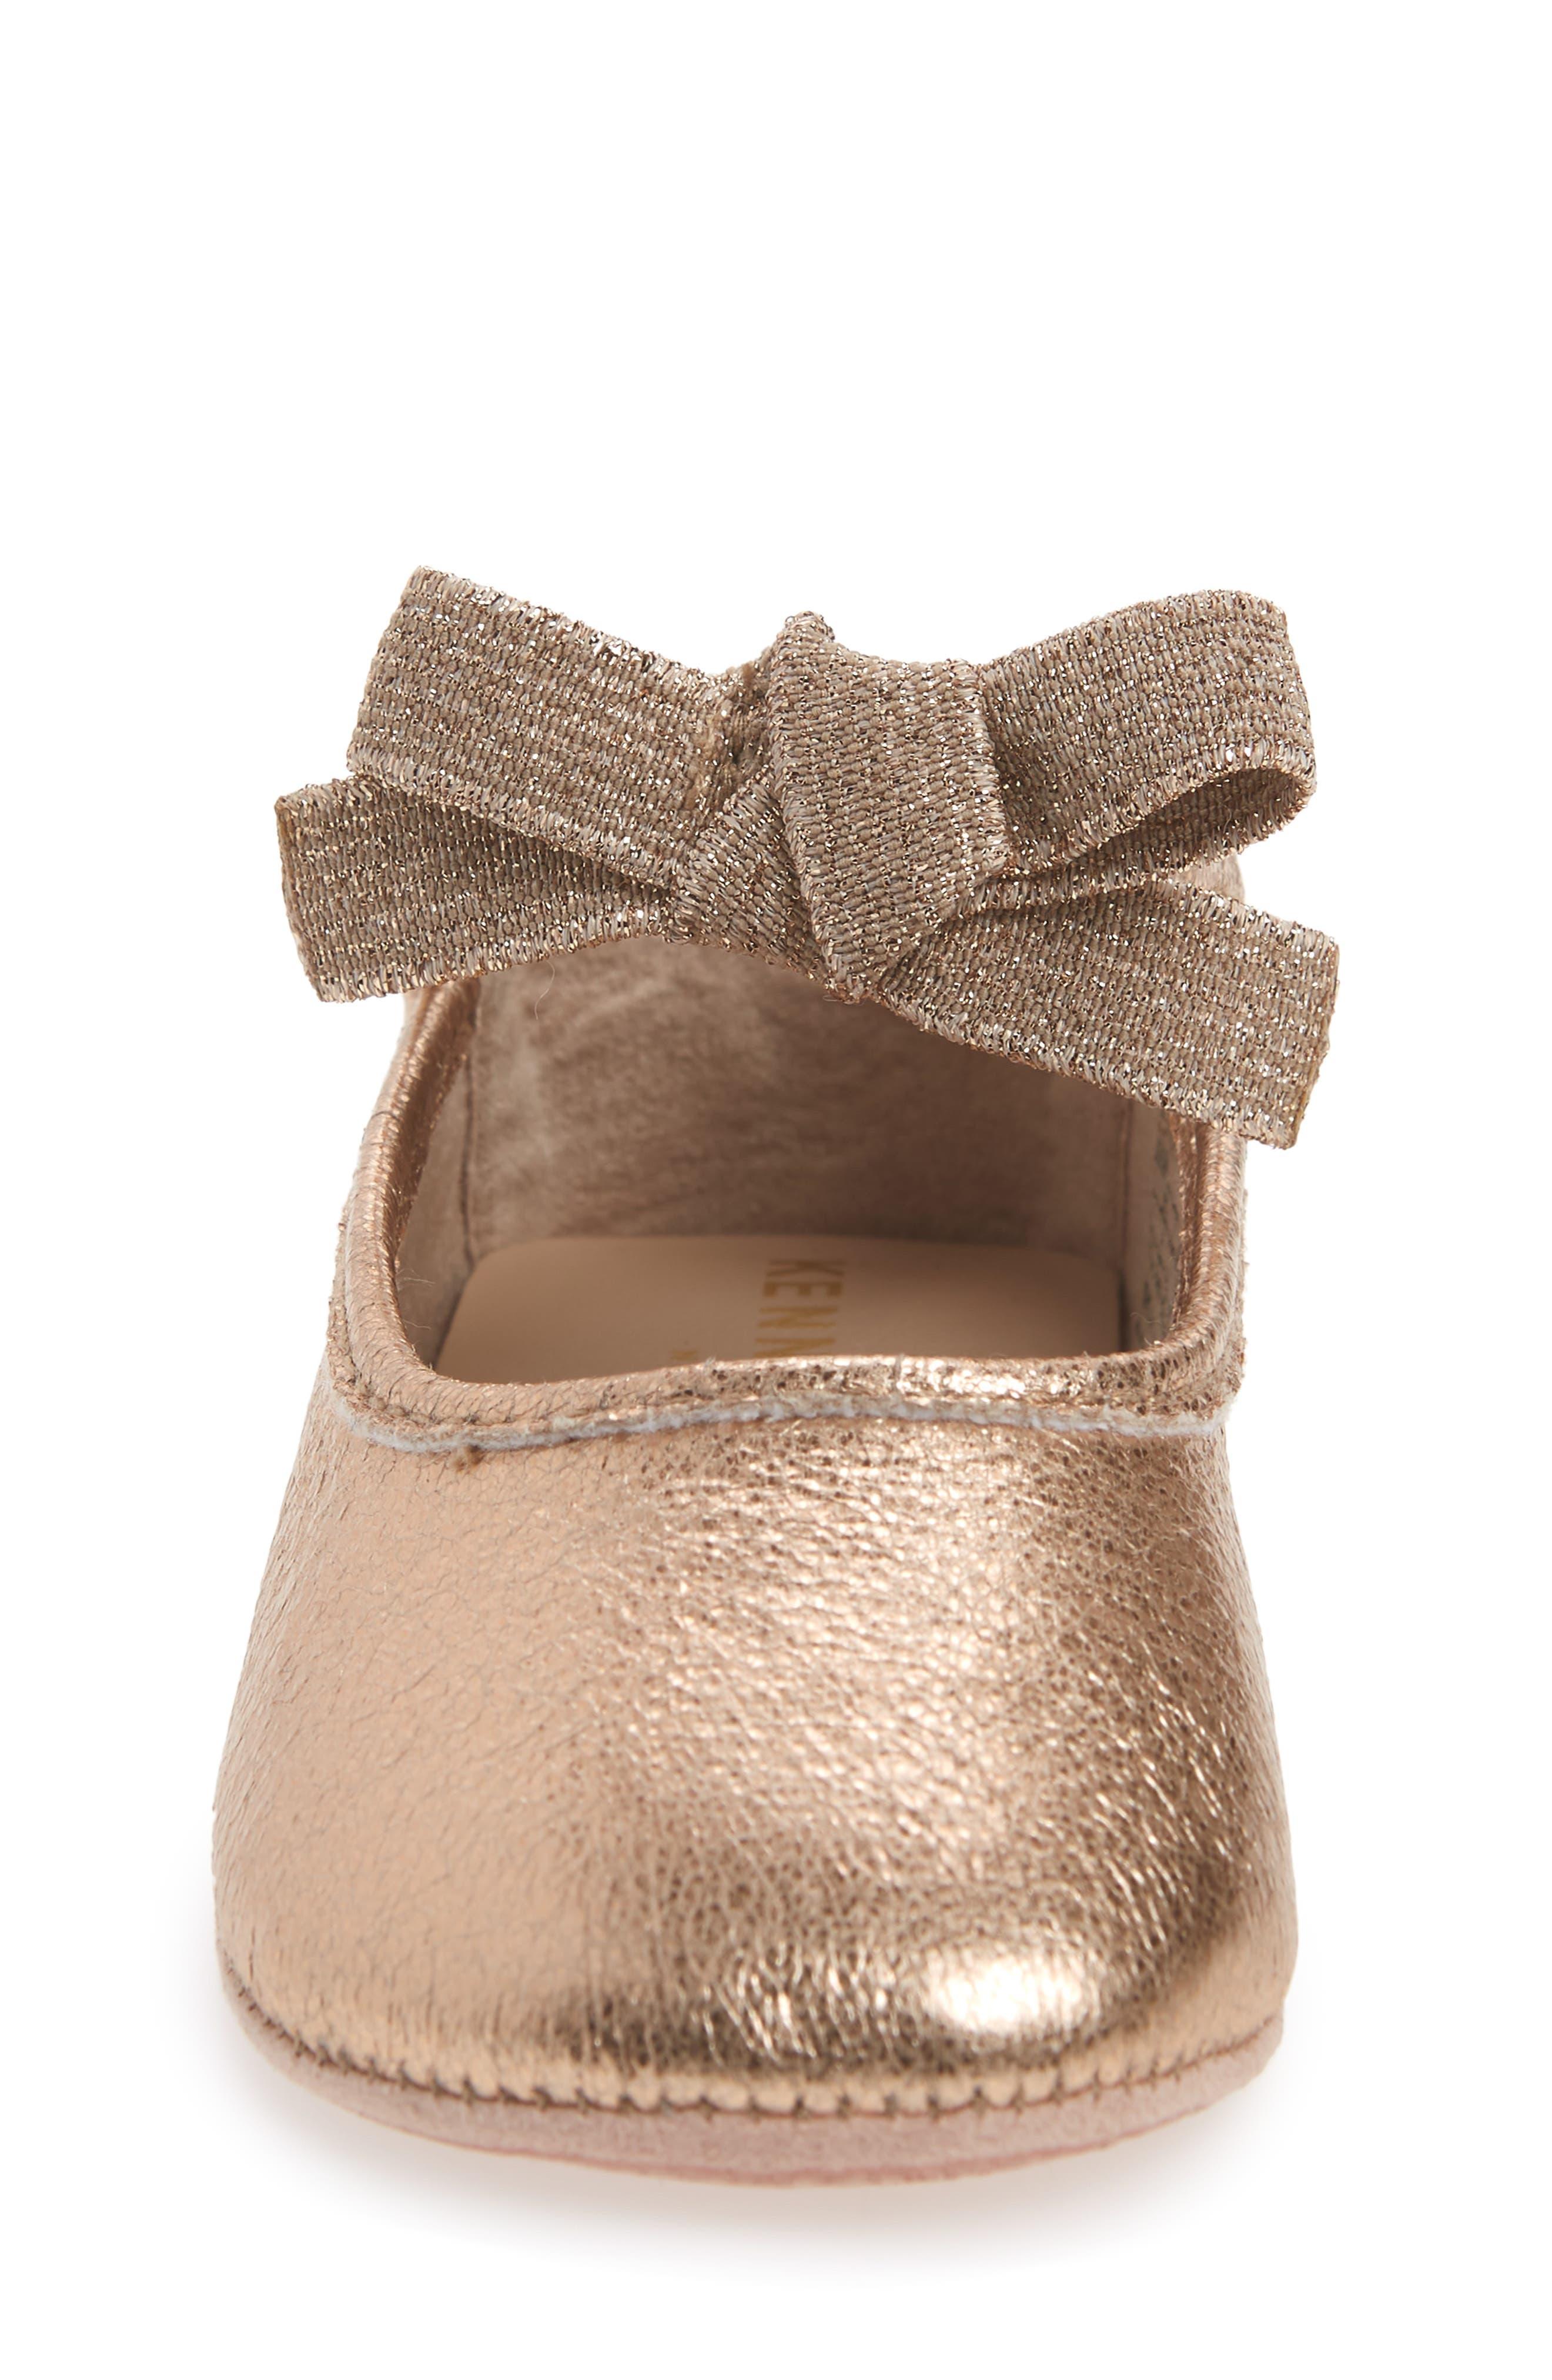 Rose Bow Metallic Ballet Flat,                             Alternate thumbnail 4, color,                             ROSE